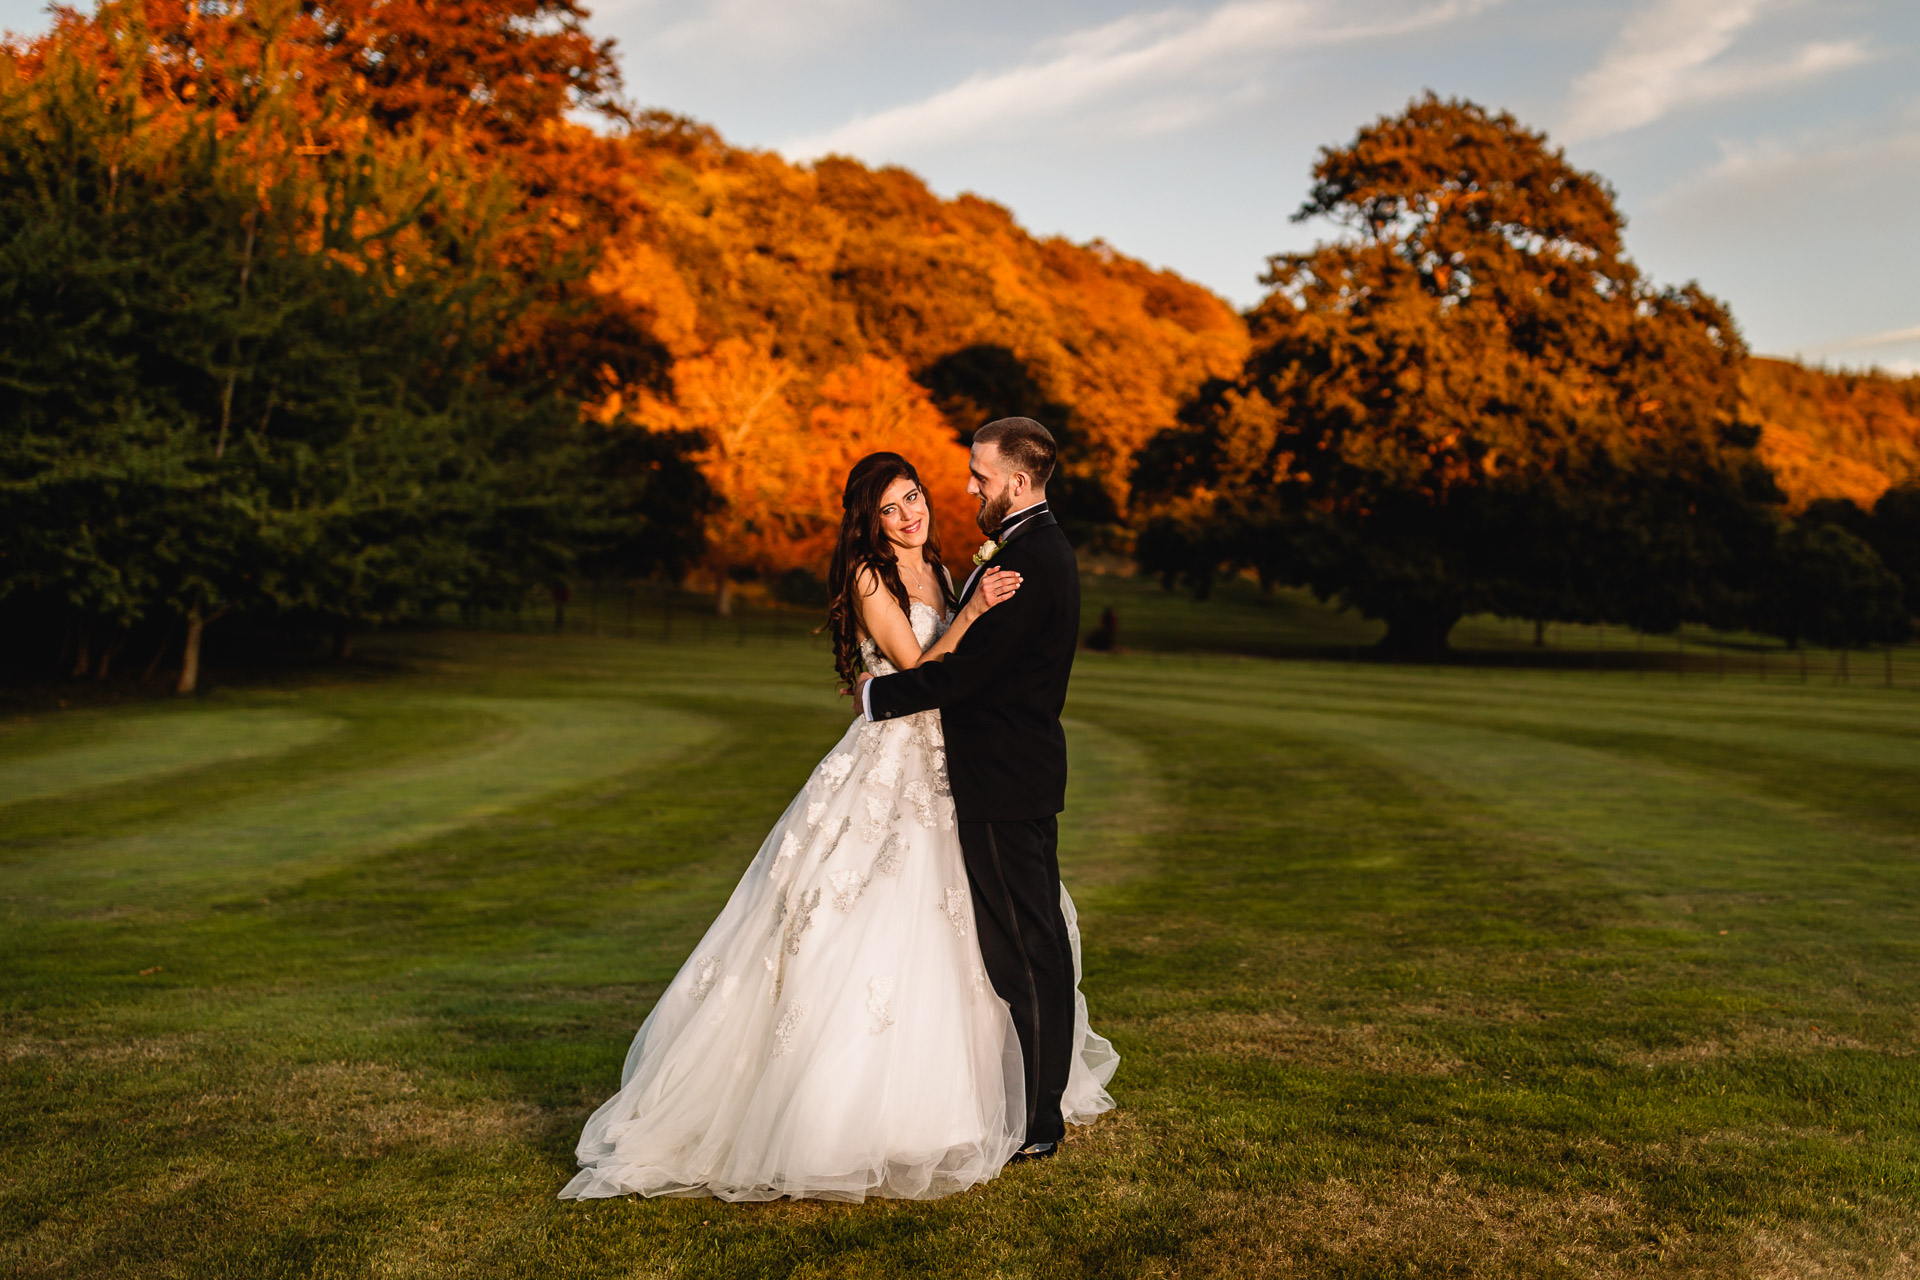 Wedding in St Audries Park Wedding Venue, Taunton